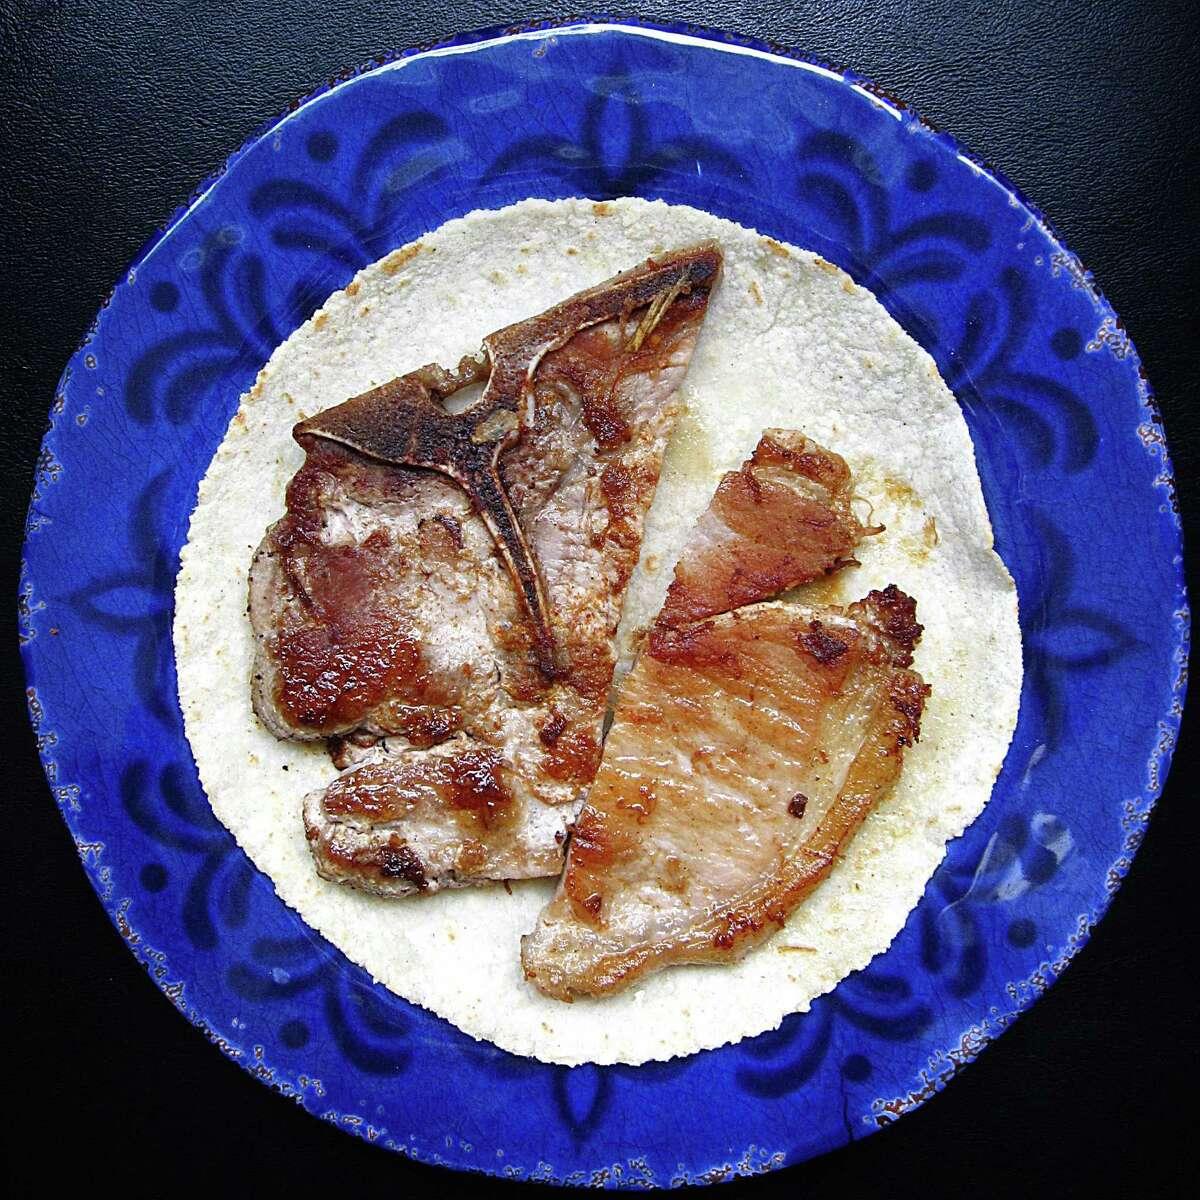 Week Four A pork chop taco on a handmade corn tortilla from Thousand Oaks Cafe.